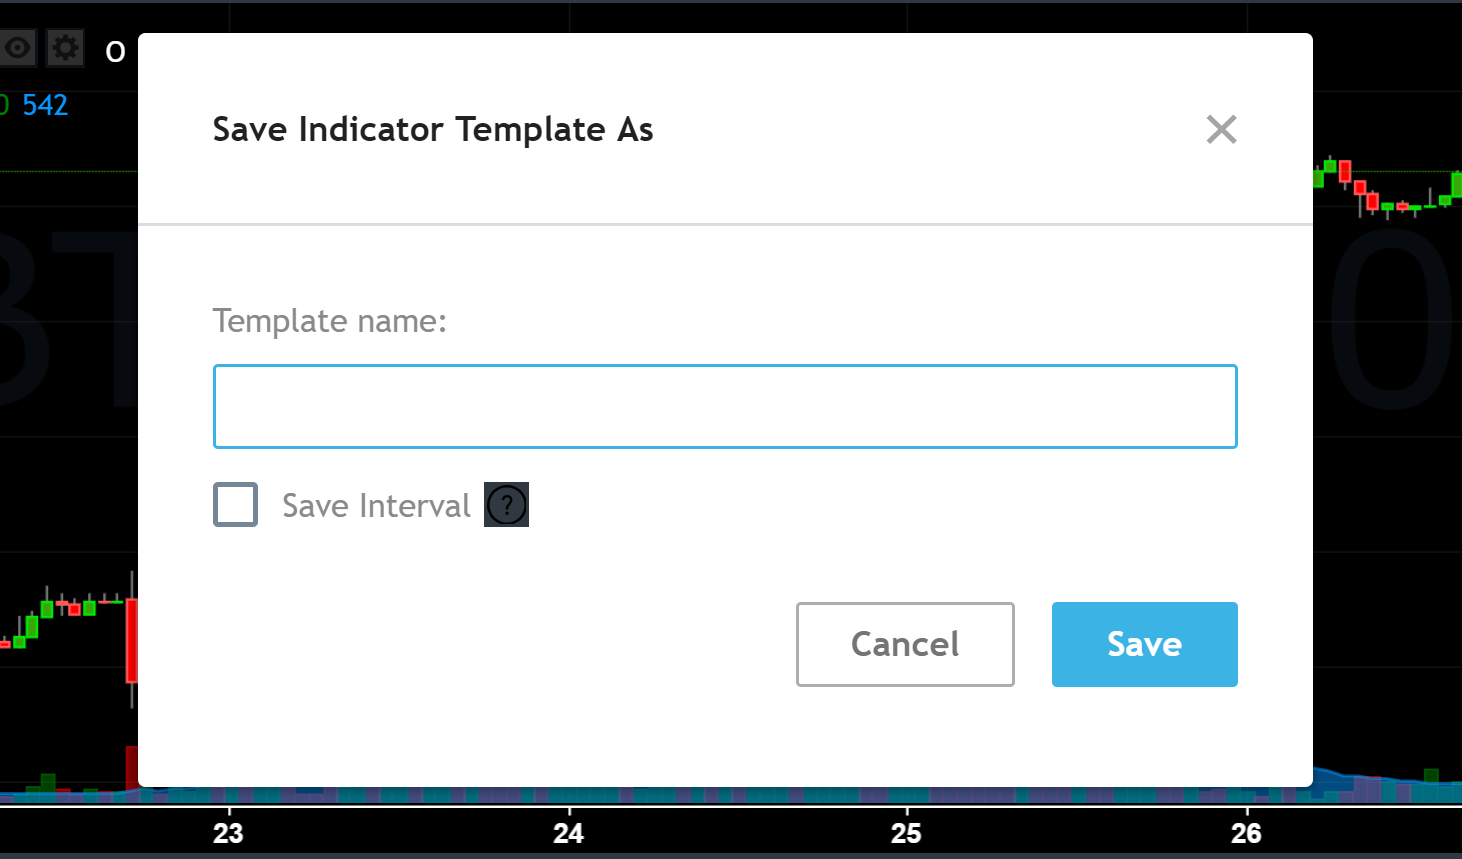 How do I use study templates? How do I save, share or load